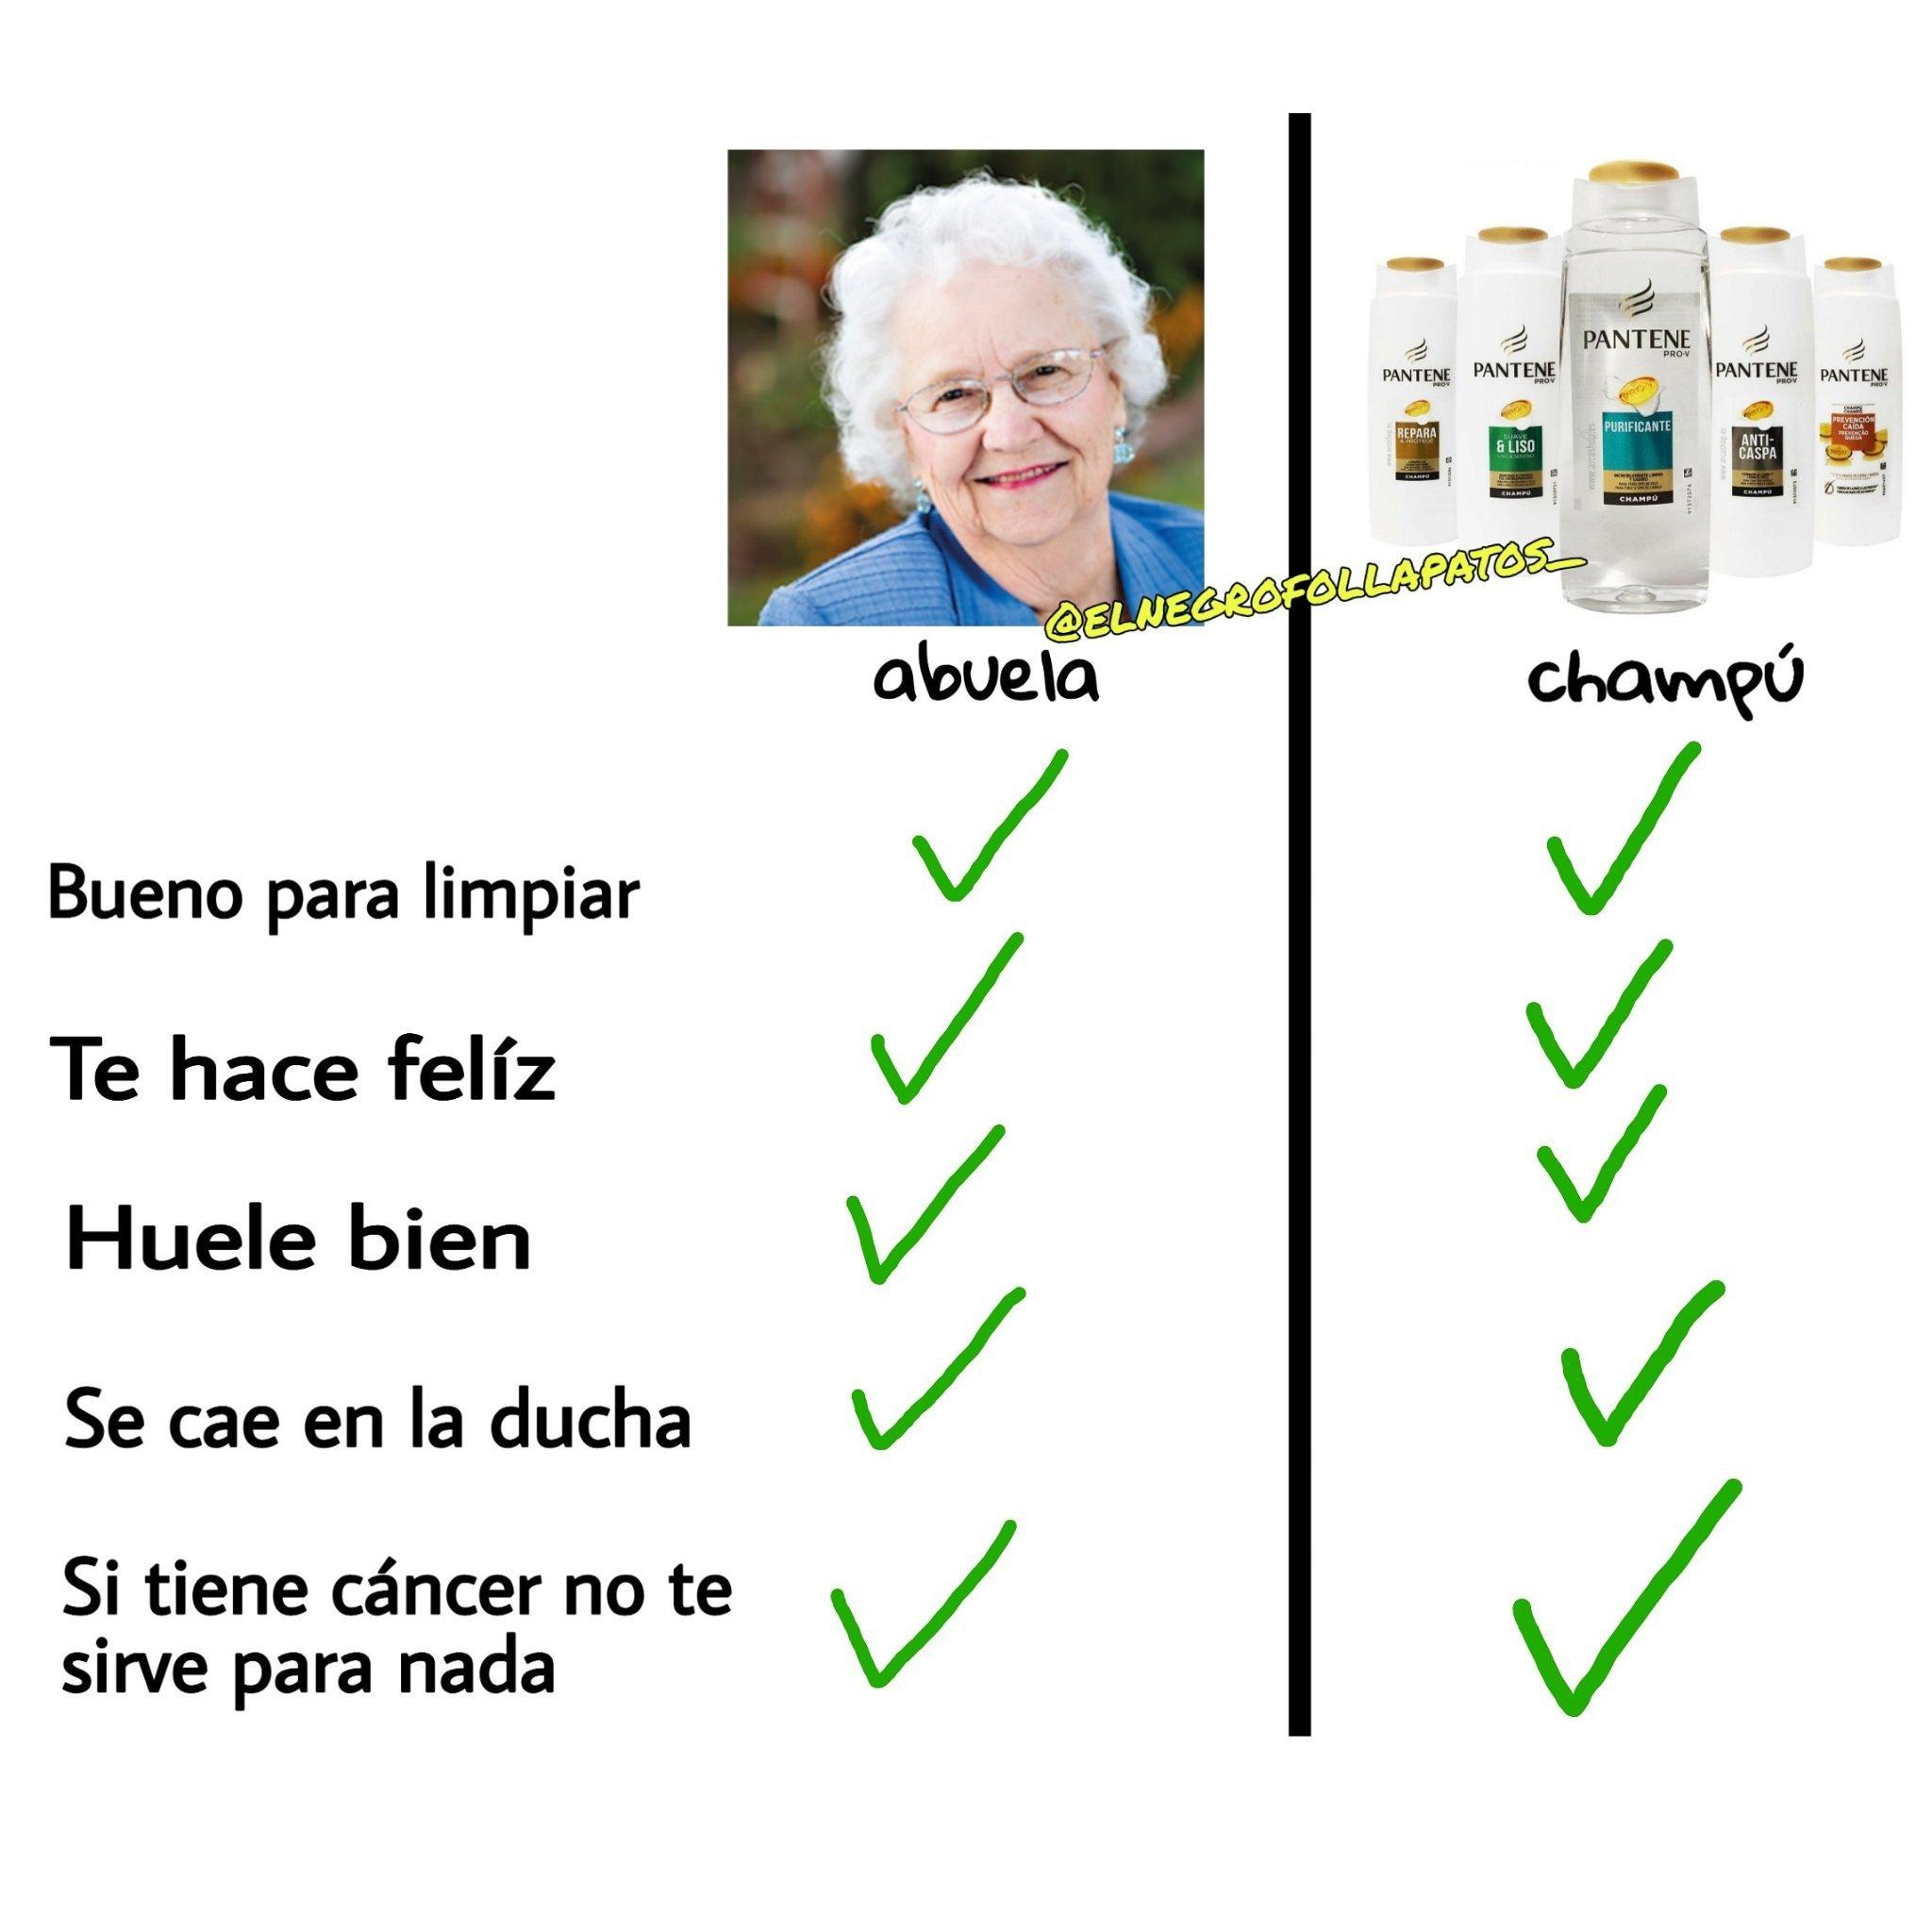 Abuela/Champú - meme